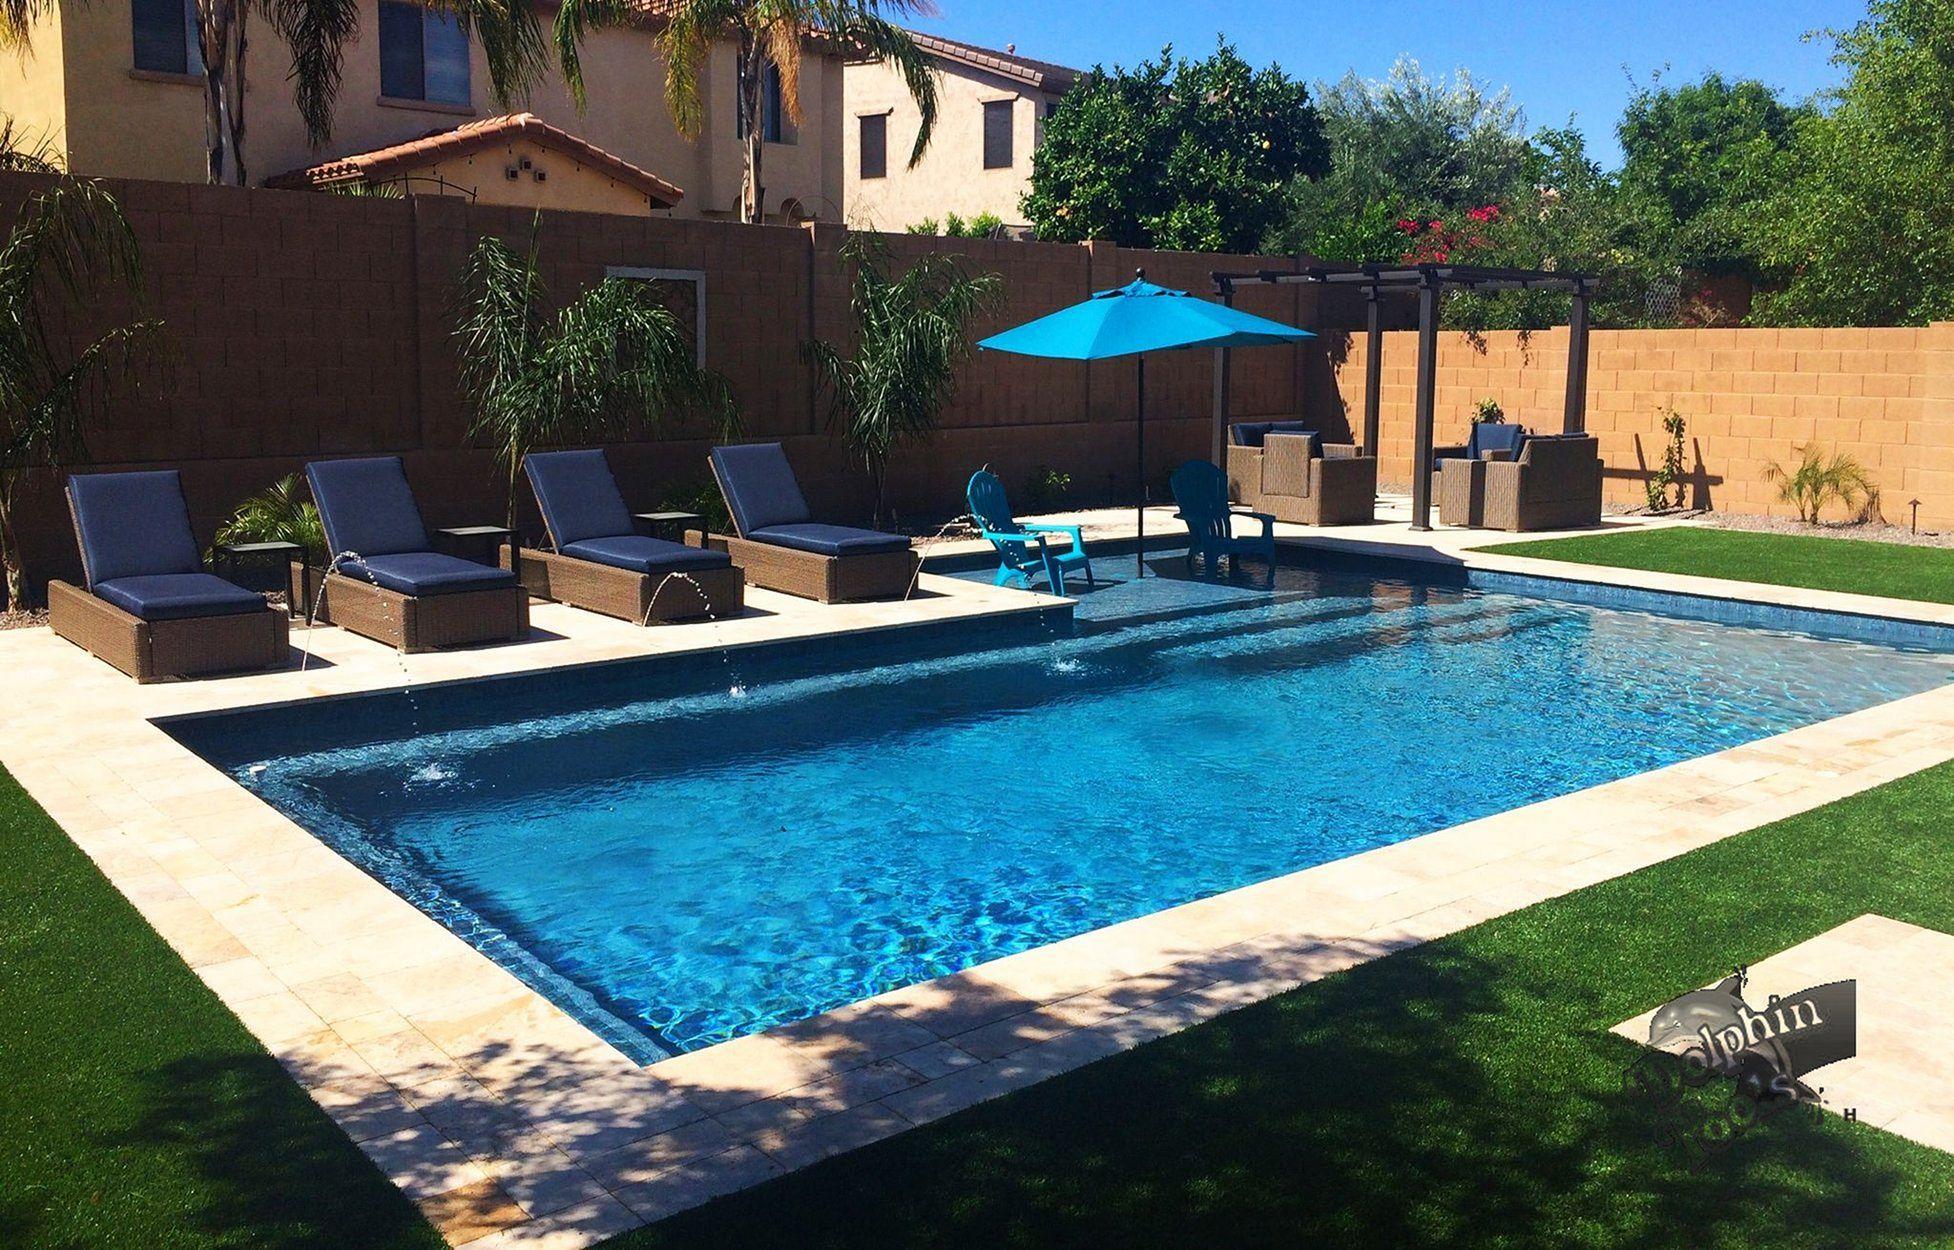 25 Stunning Rectangle Inground Pool Design Ideas With Sun Shelf Inground Pool Designs Backyard Pool Landscaping Rectangle Pool